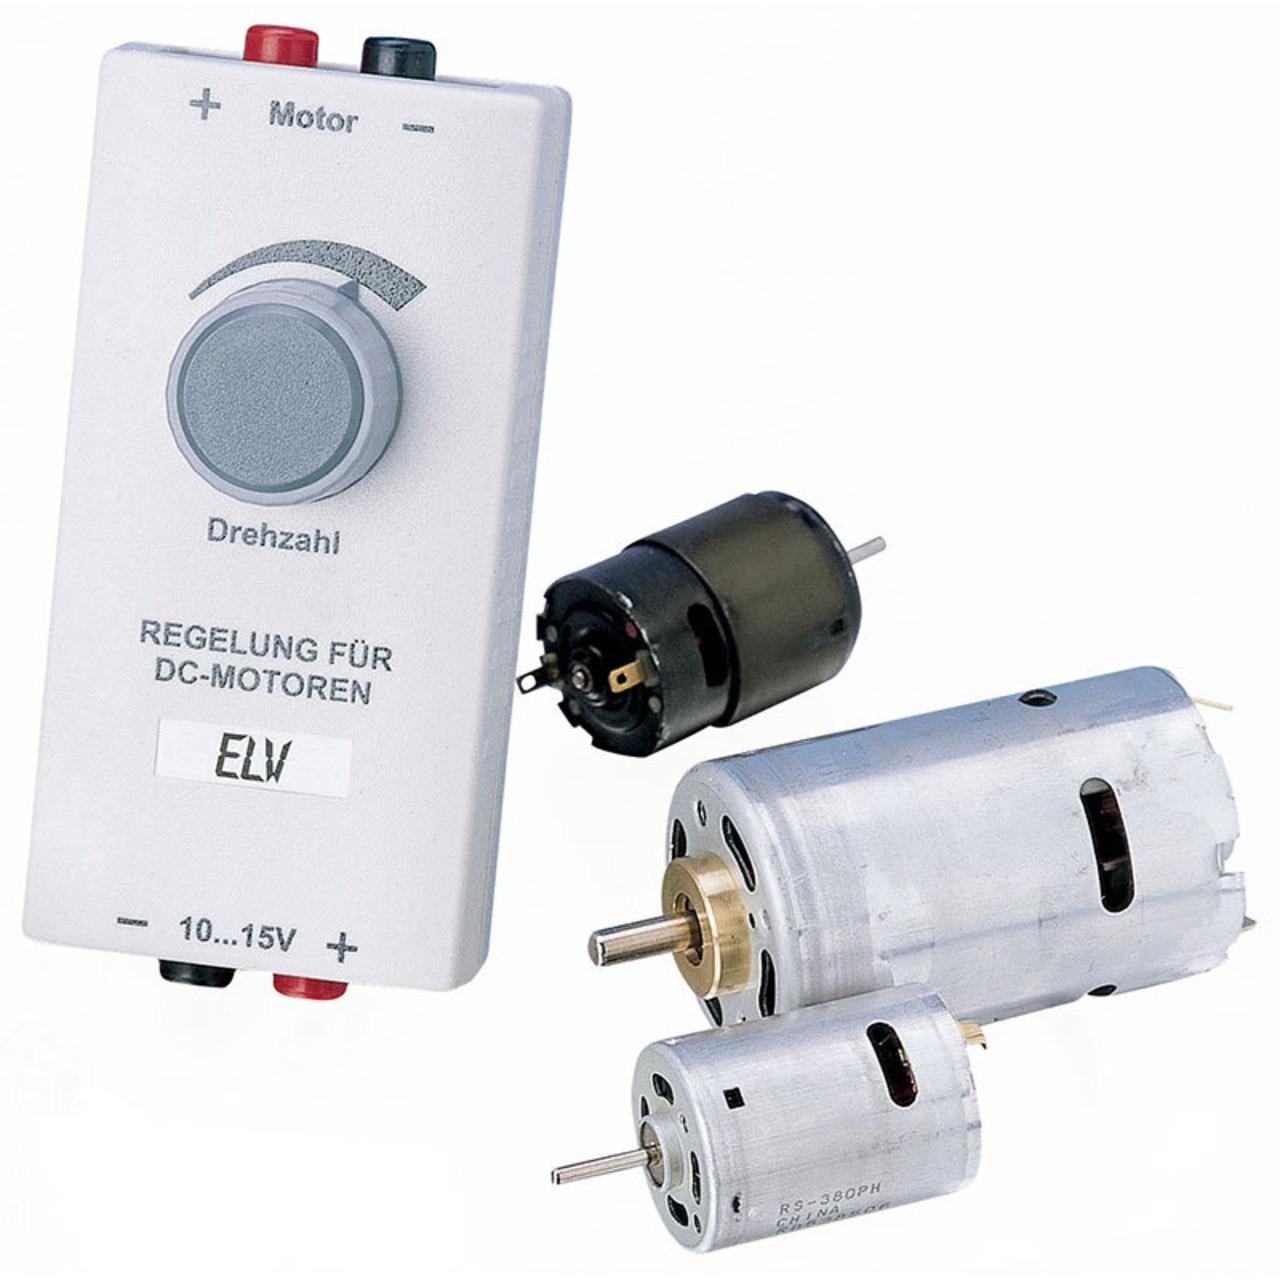 ELV Bausatz Lastunabhängige DC-Motor-Drehzahlregelung